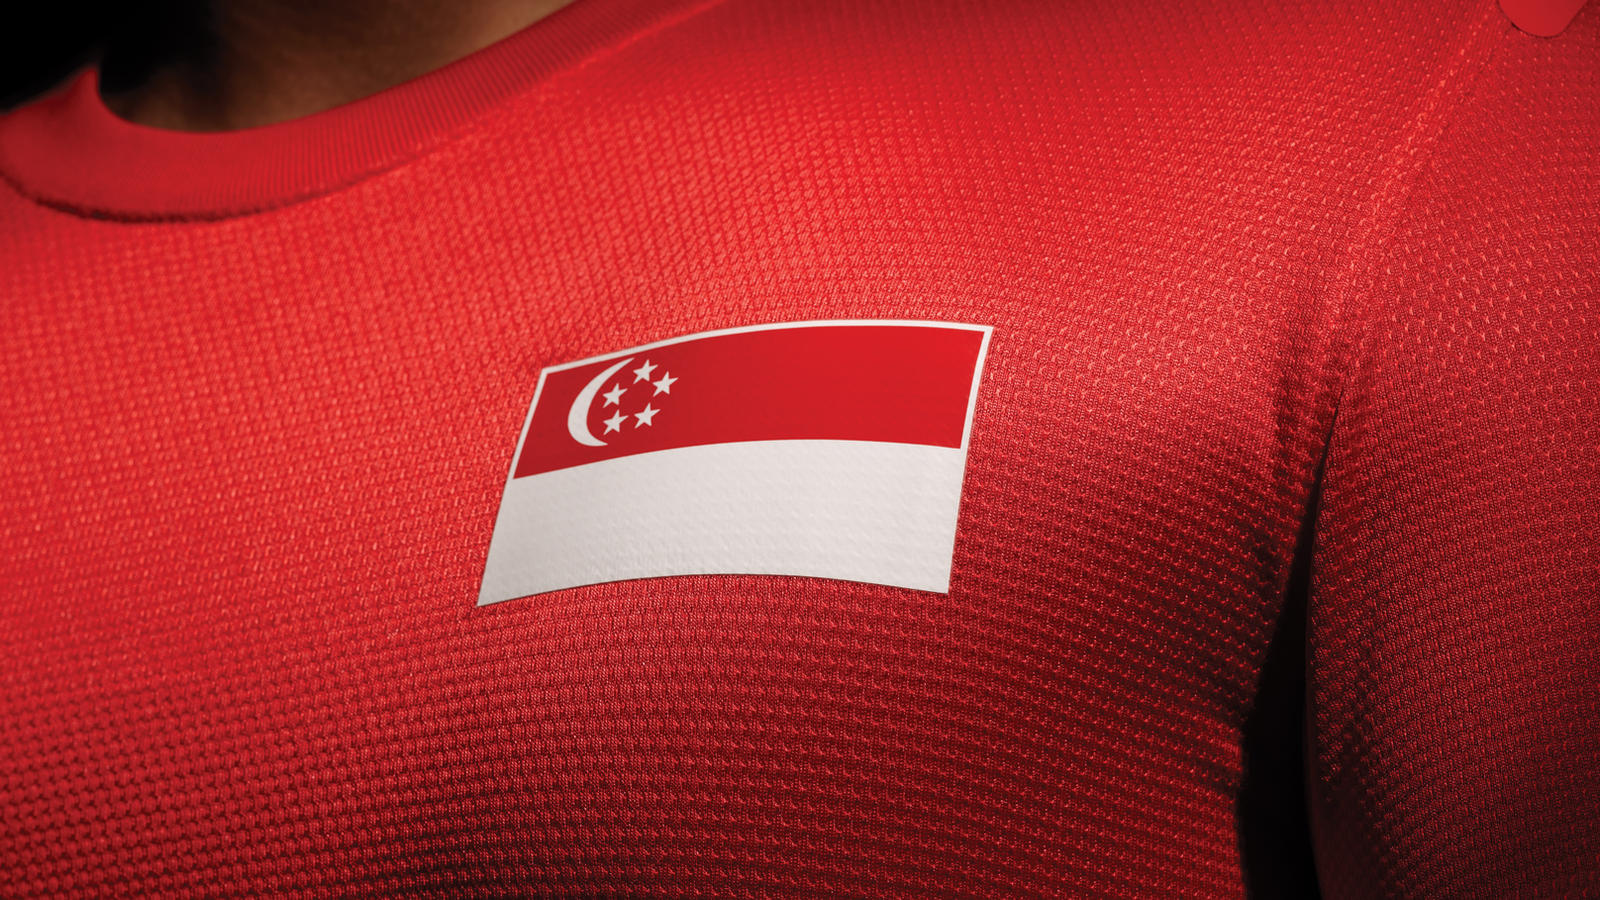 NTK_Singapore_H_Crest_R_detail